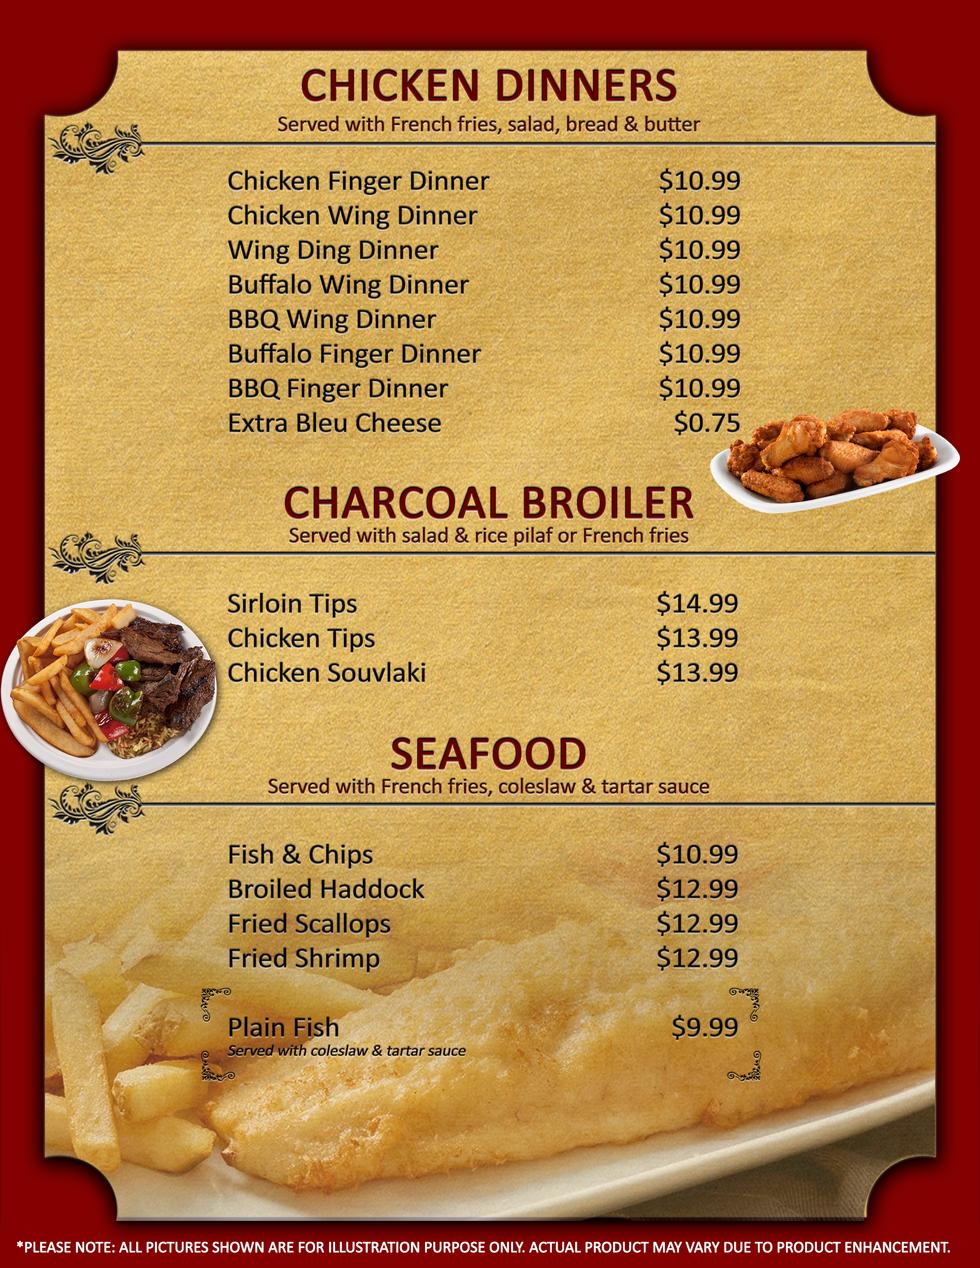 Chicken, Steak & Seafood Dinners